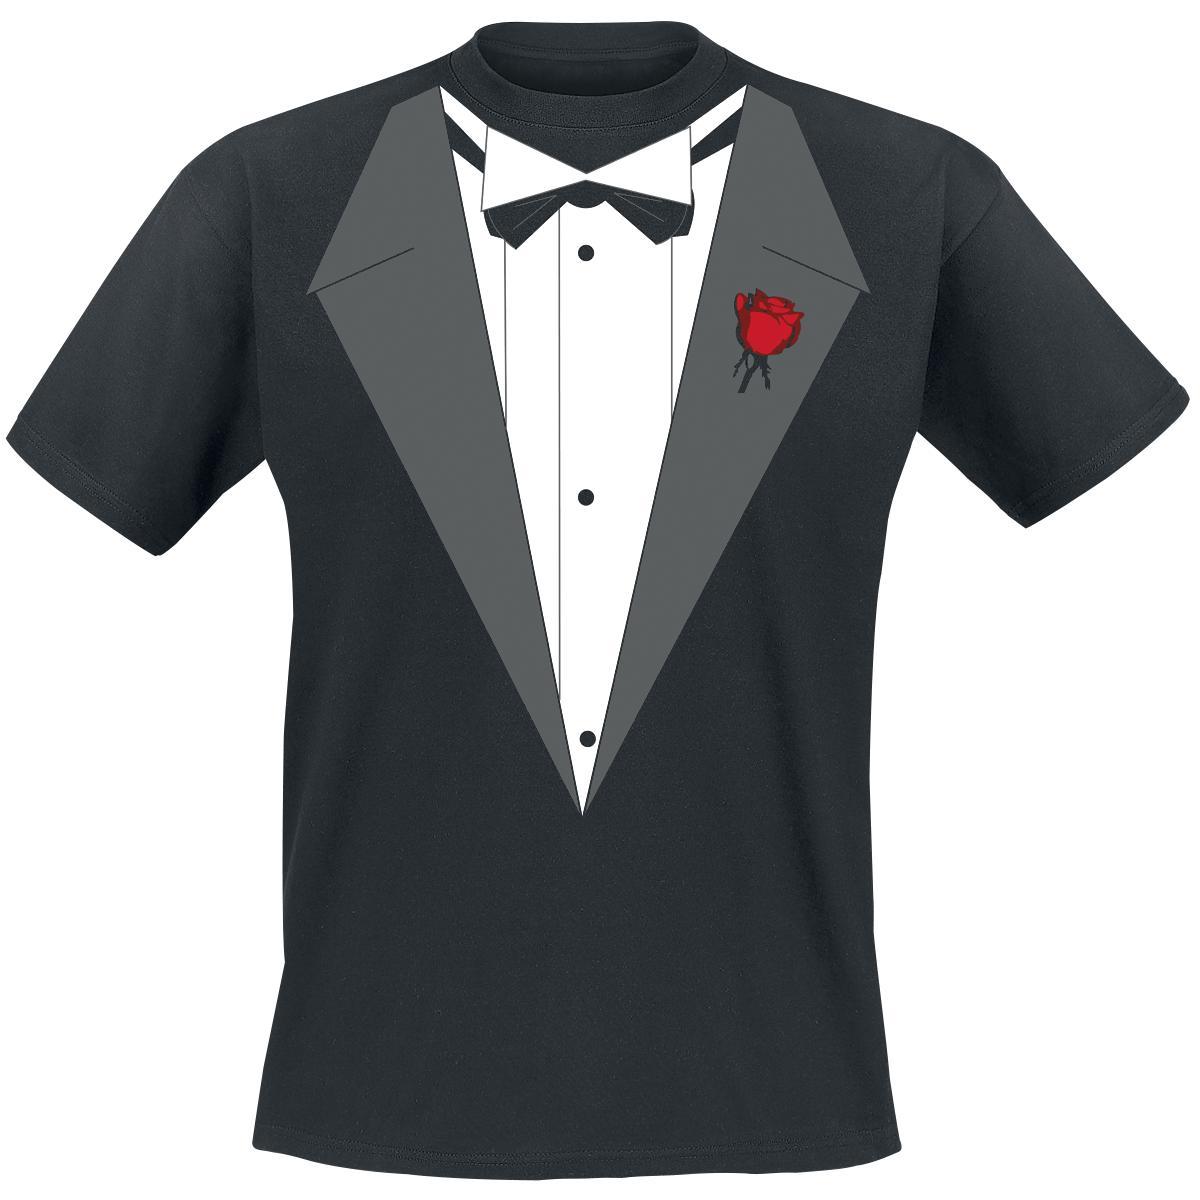 Vito's Tuxedo T-shirt Design tee